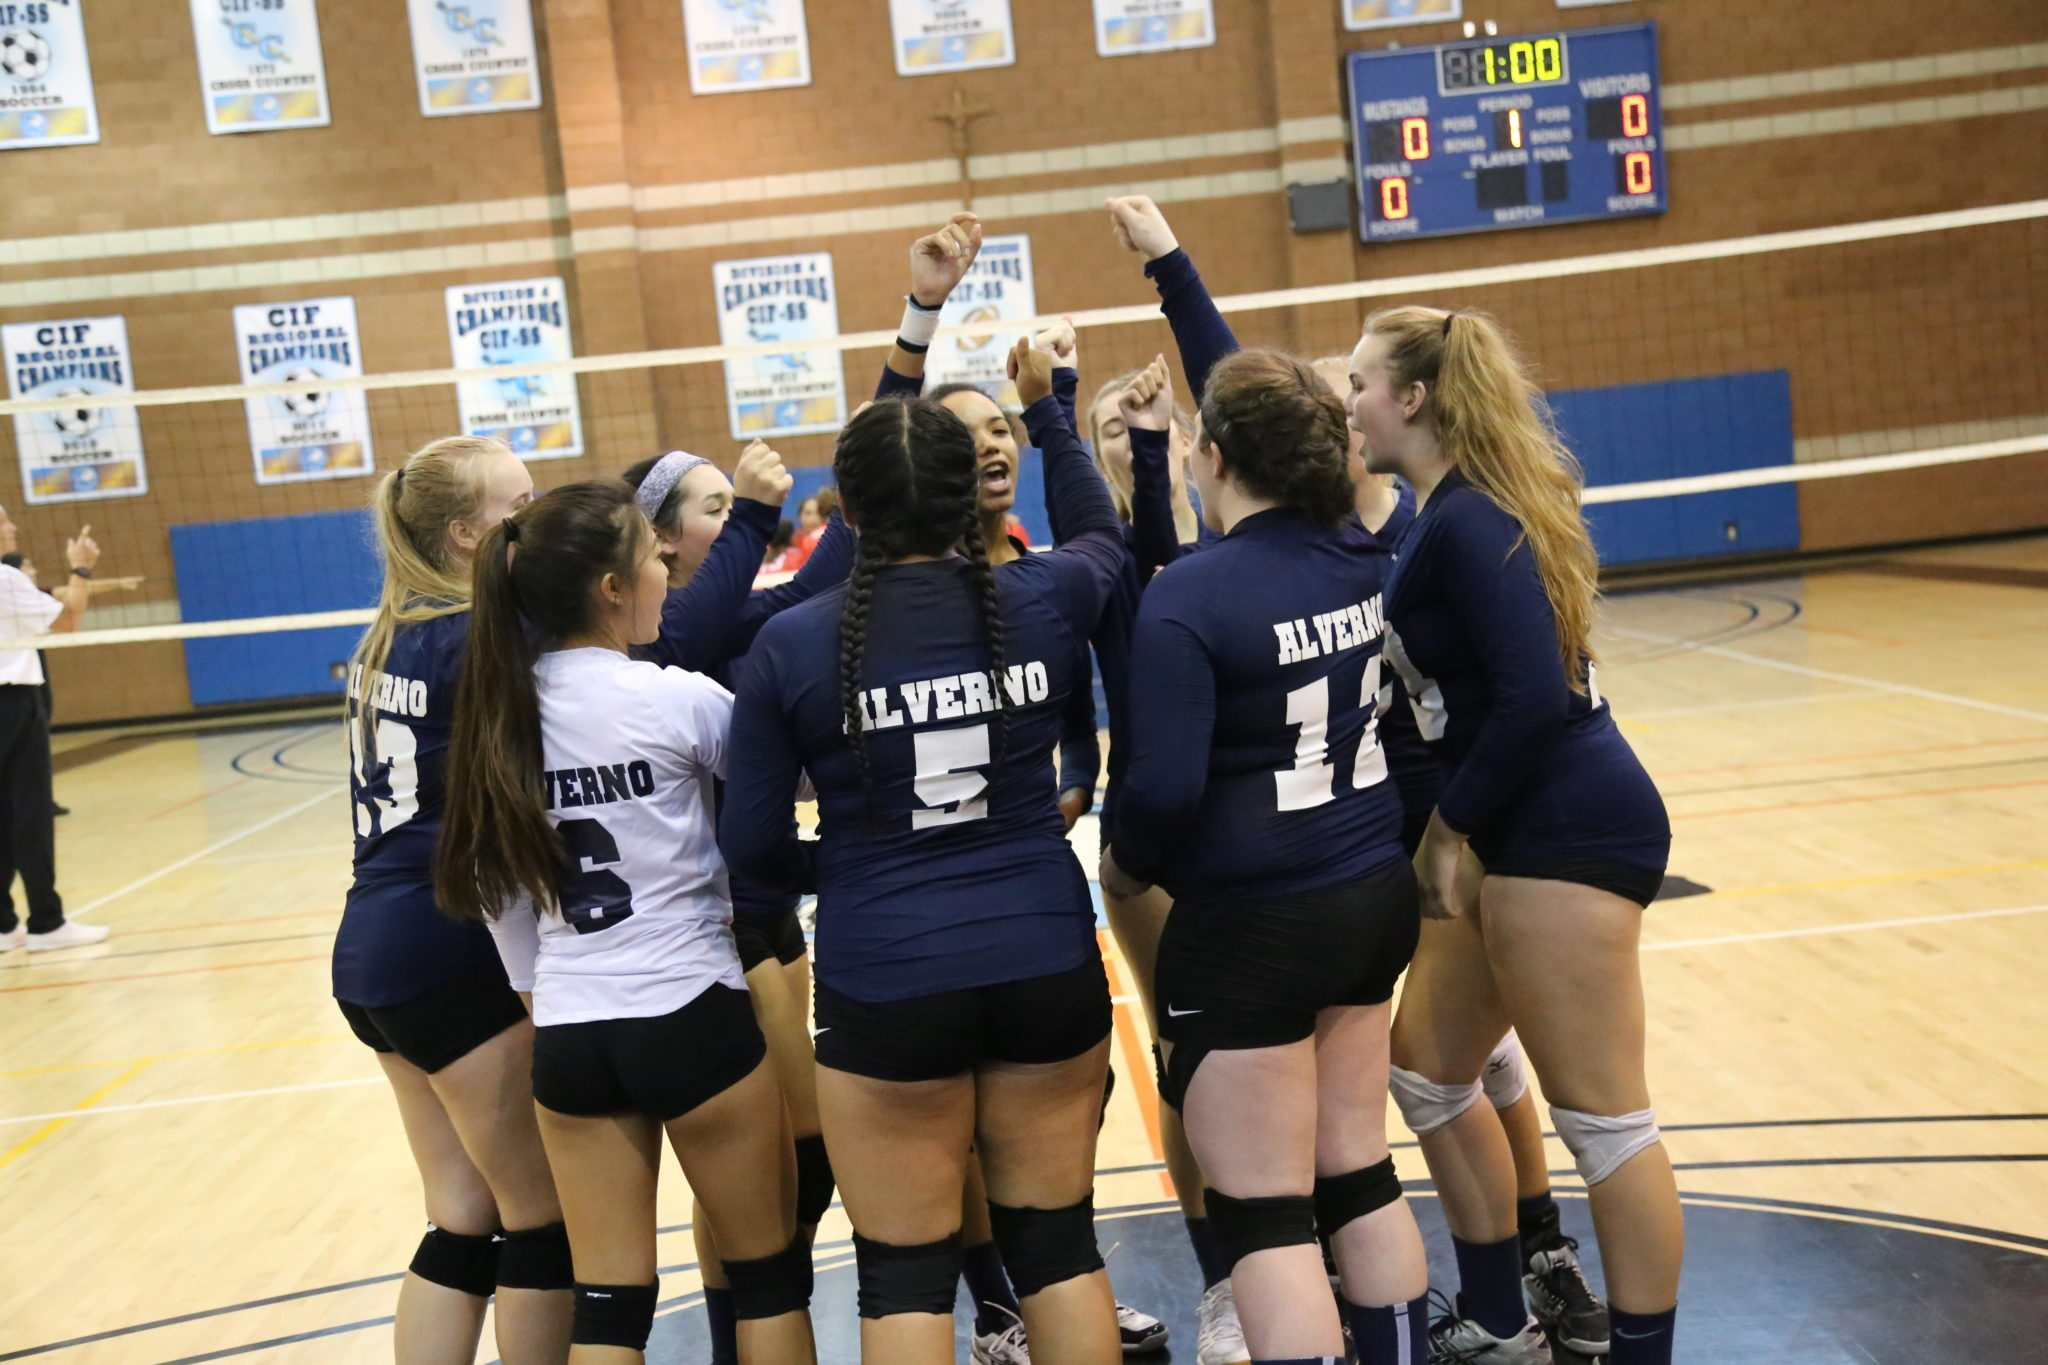 Alverno Heights Academy Welcomes New Head Volleyball Coach Regarding Del Oro High School Calendar